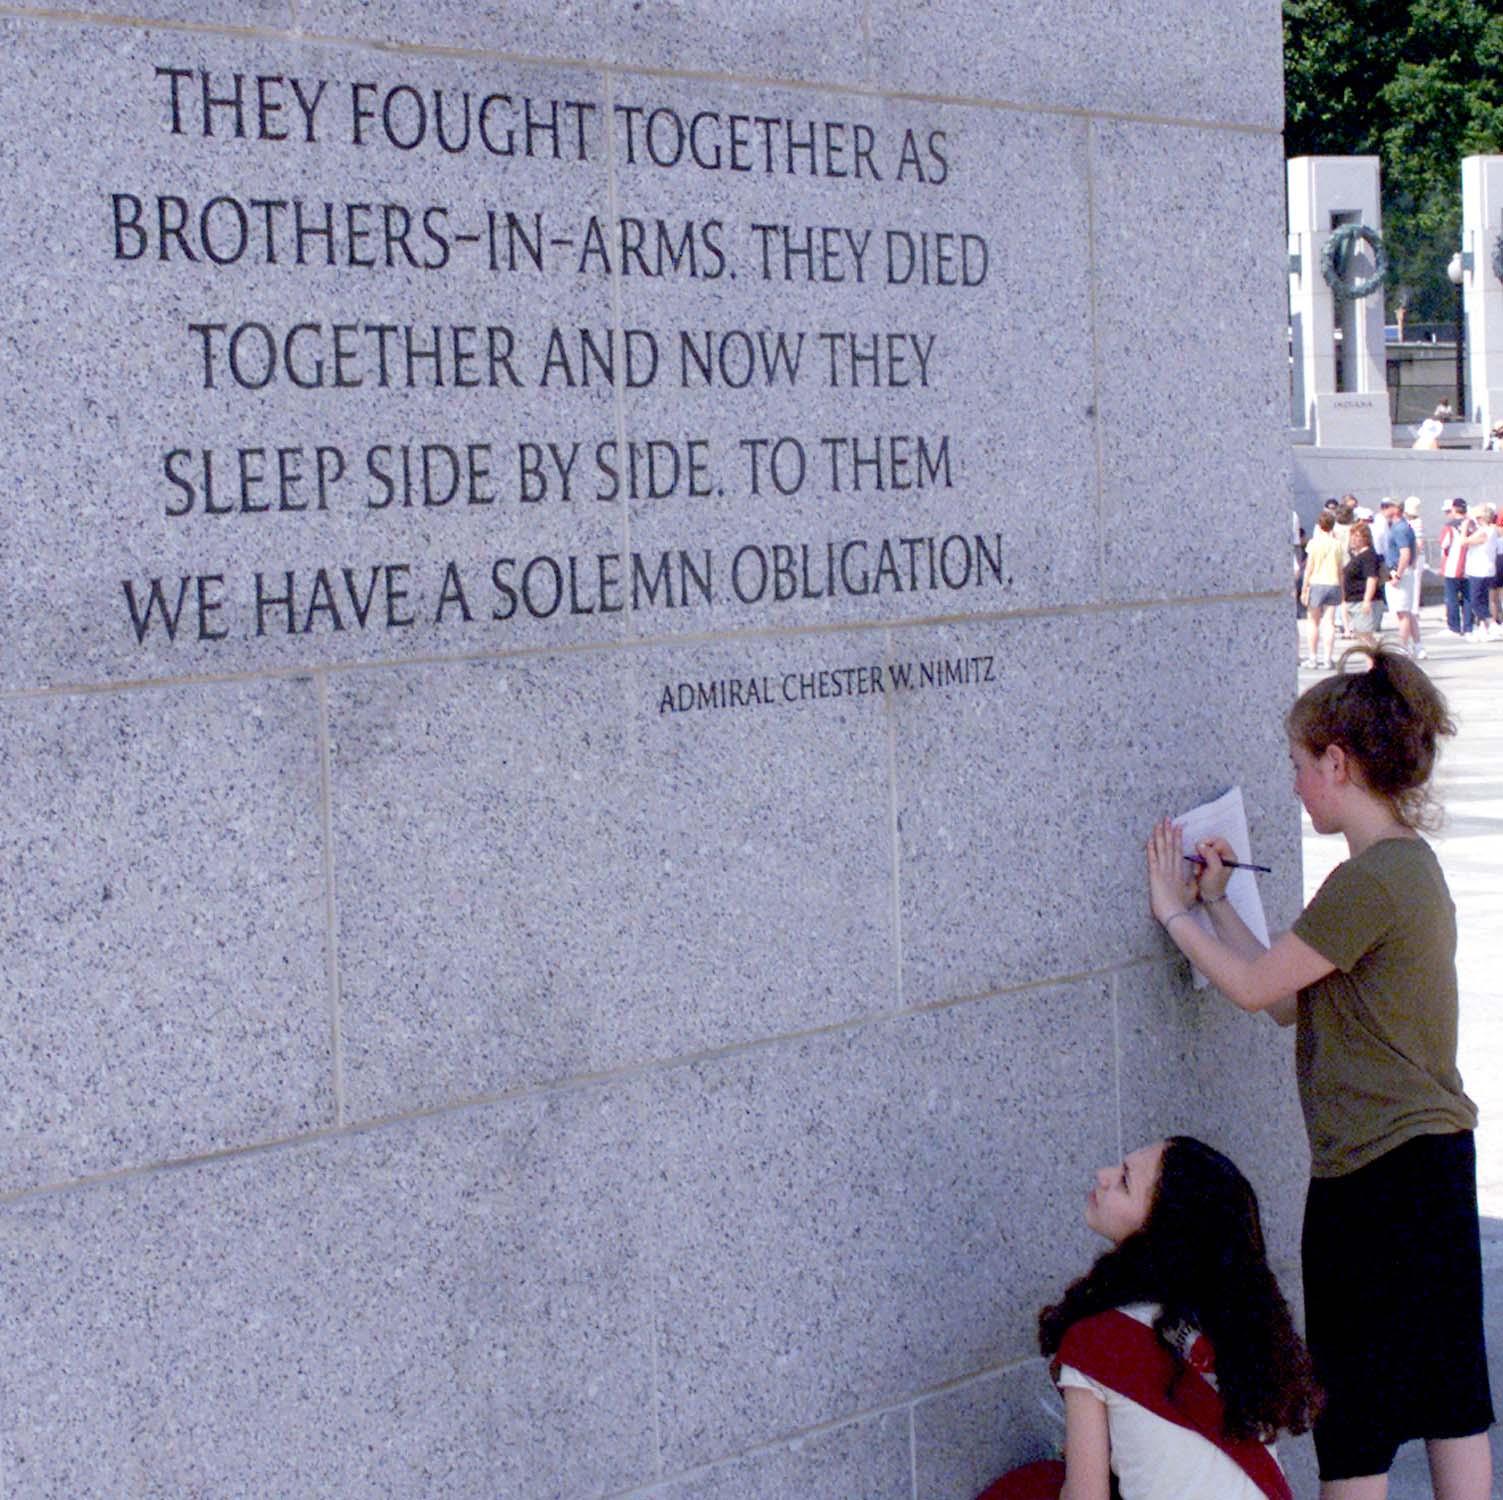 Ww2 Quotes: Harrys Truman World War 2 Quotes. QuotesGram